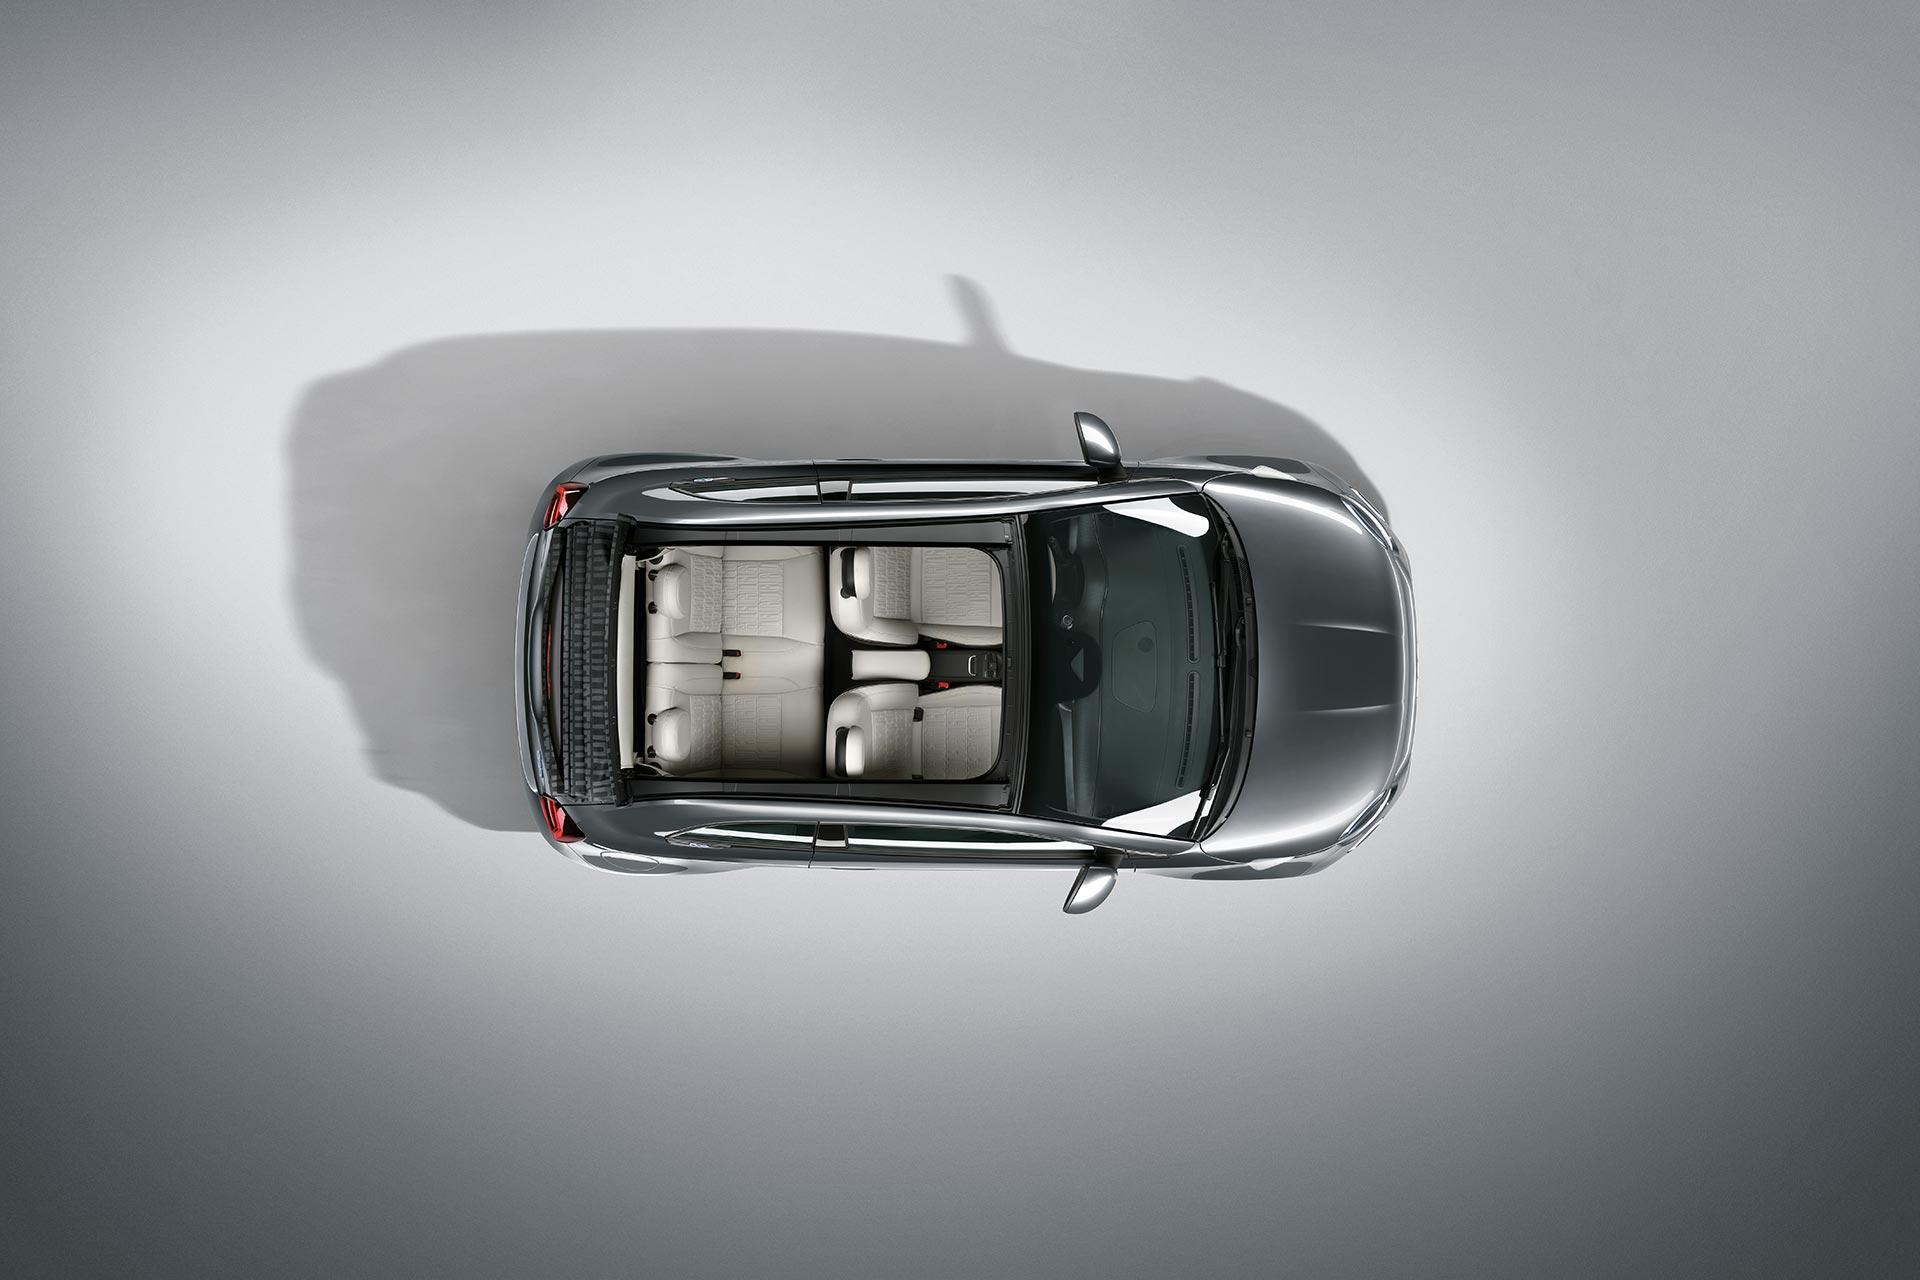 Fiat 500c electric La Prima top view